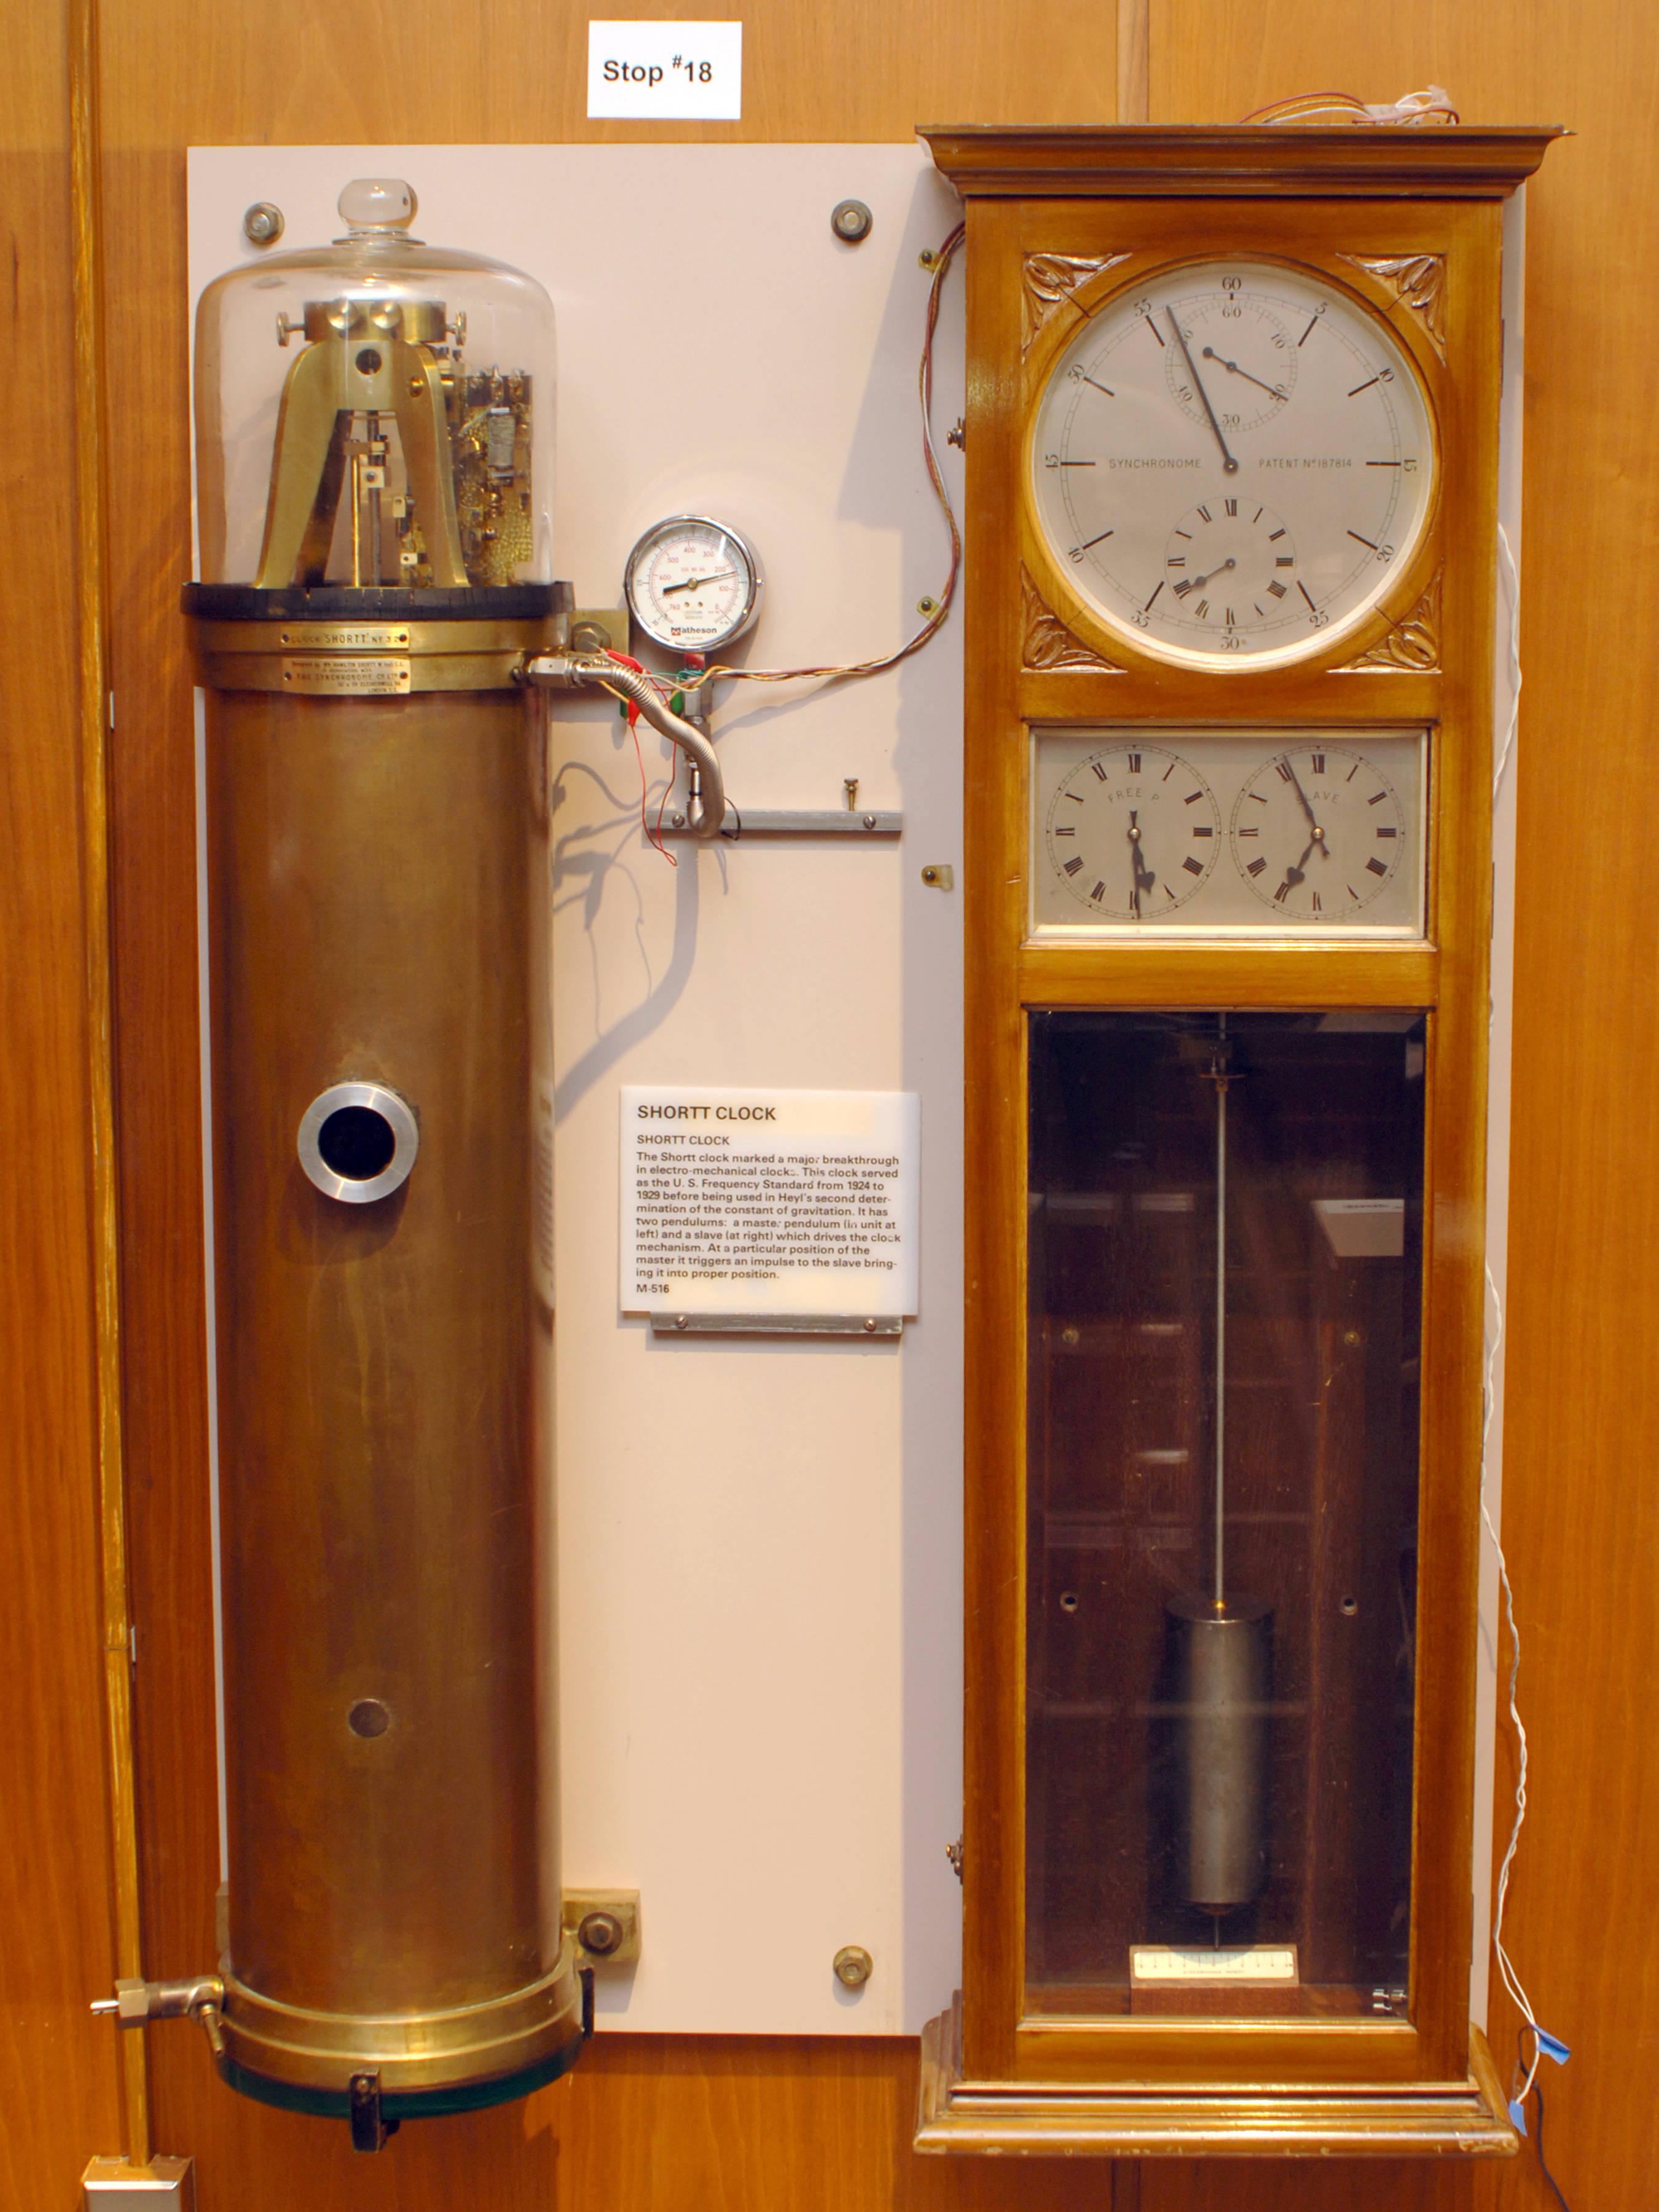 Shortt–Synchronome clock